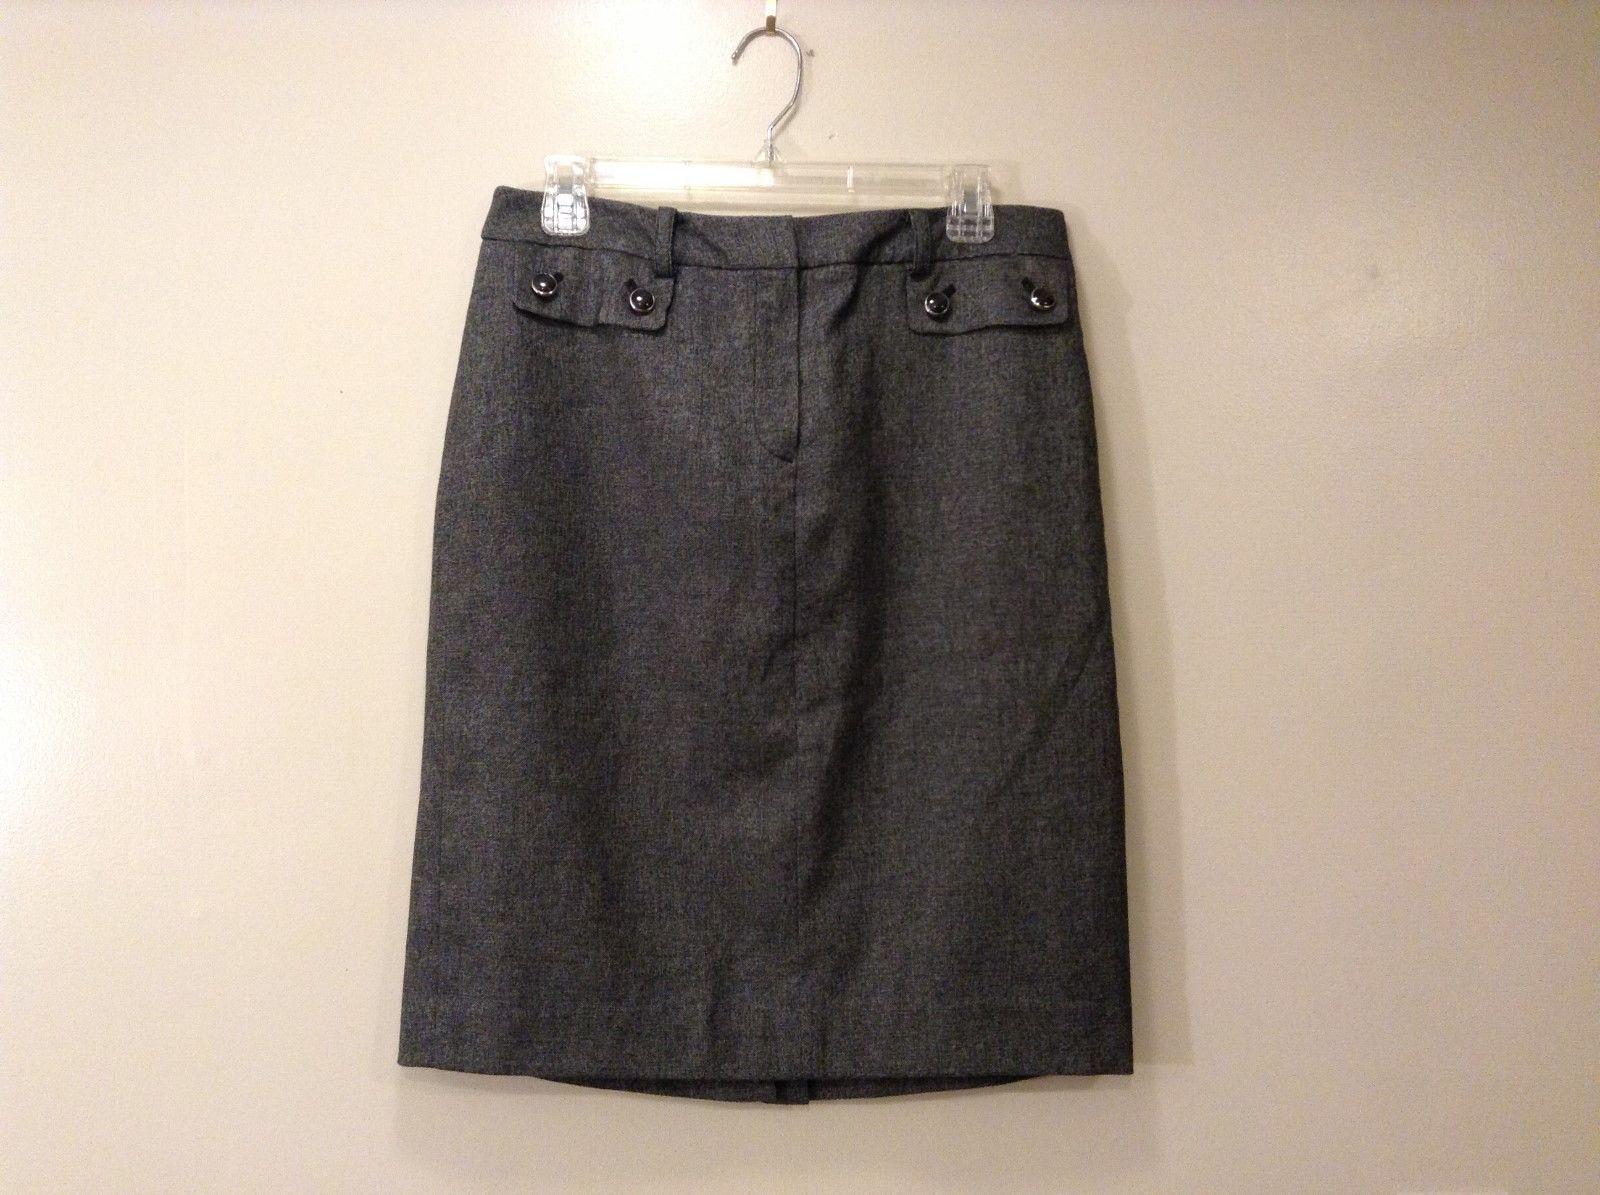 Ladies Jones New York Stretchy Gray Skirt Sz 8